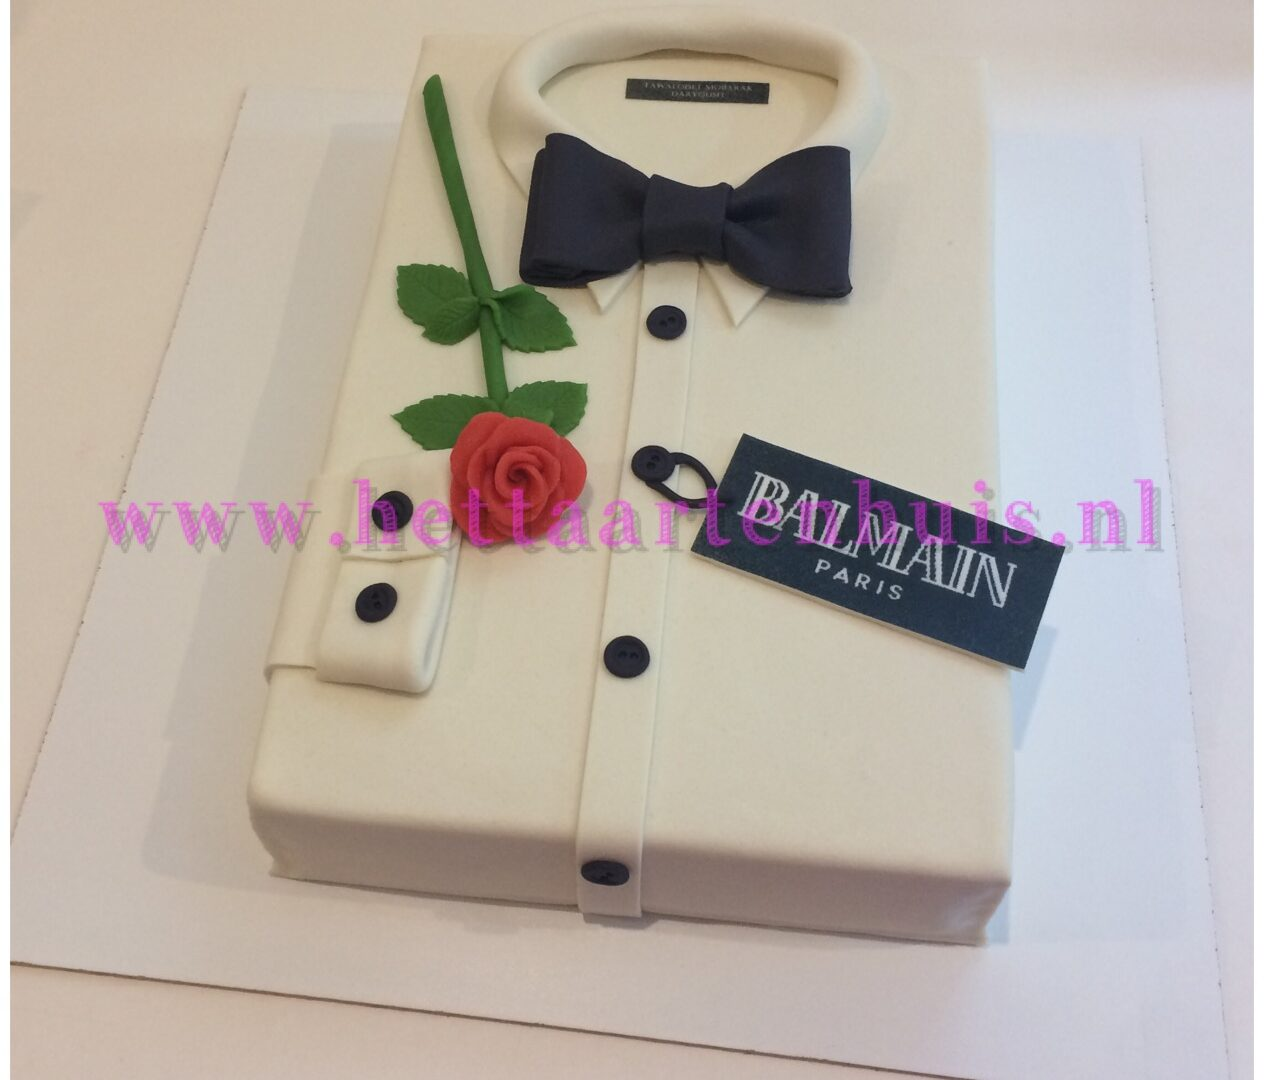 Balmain overhemd taart